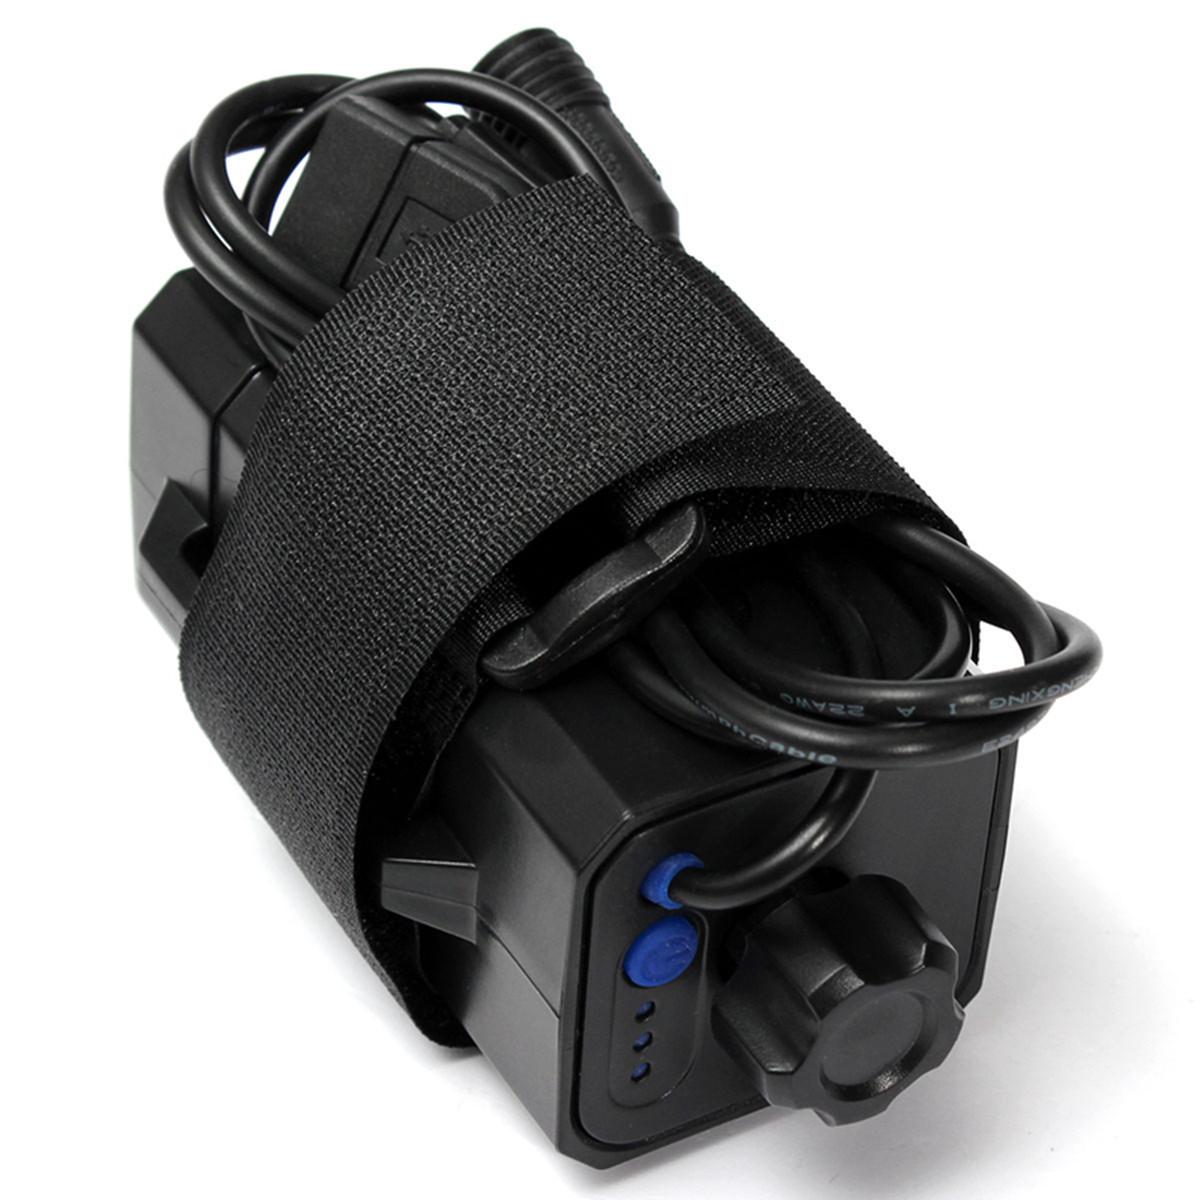 AA AAA 14500 18650 batteria battery holder Storage Case Box contenitore Arduino